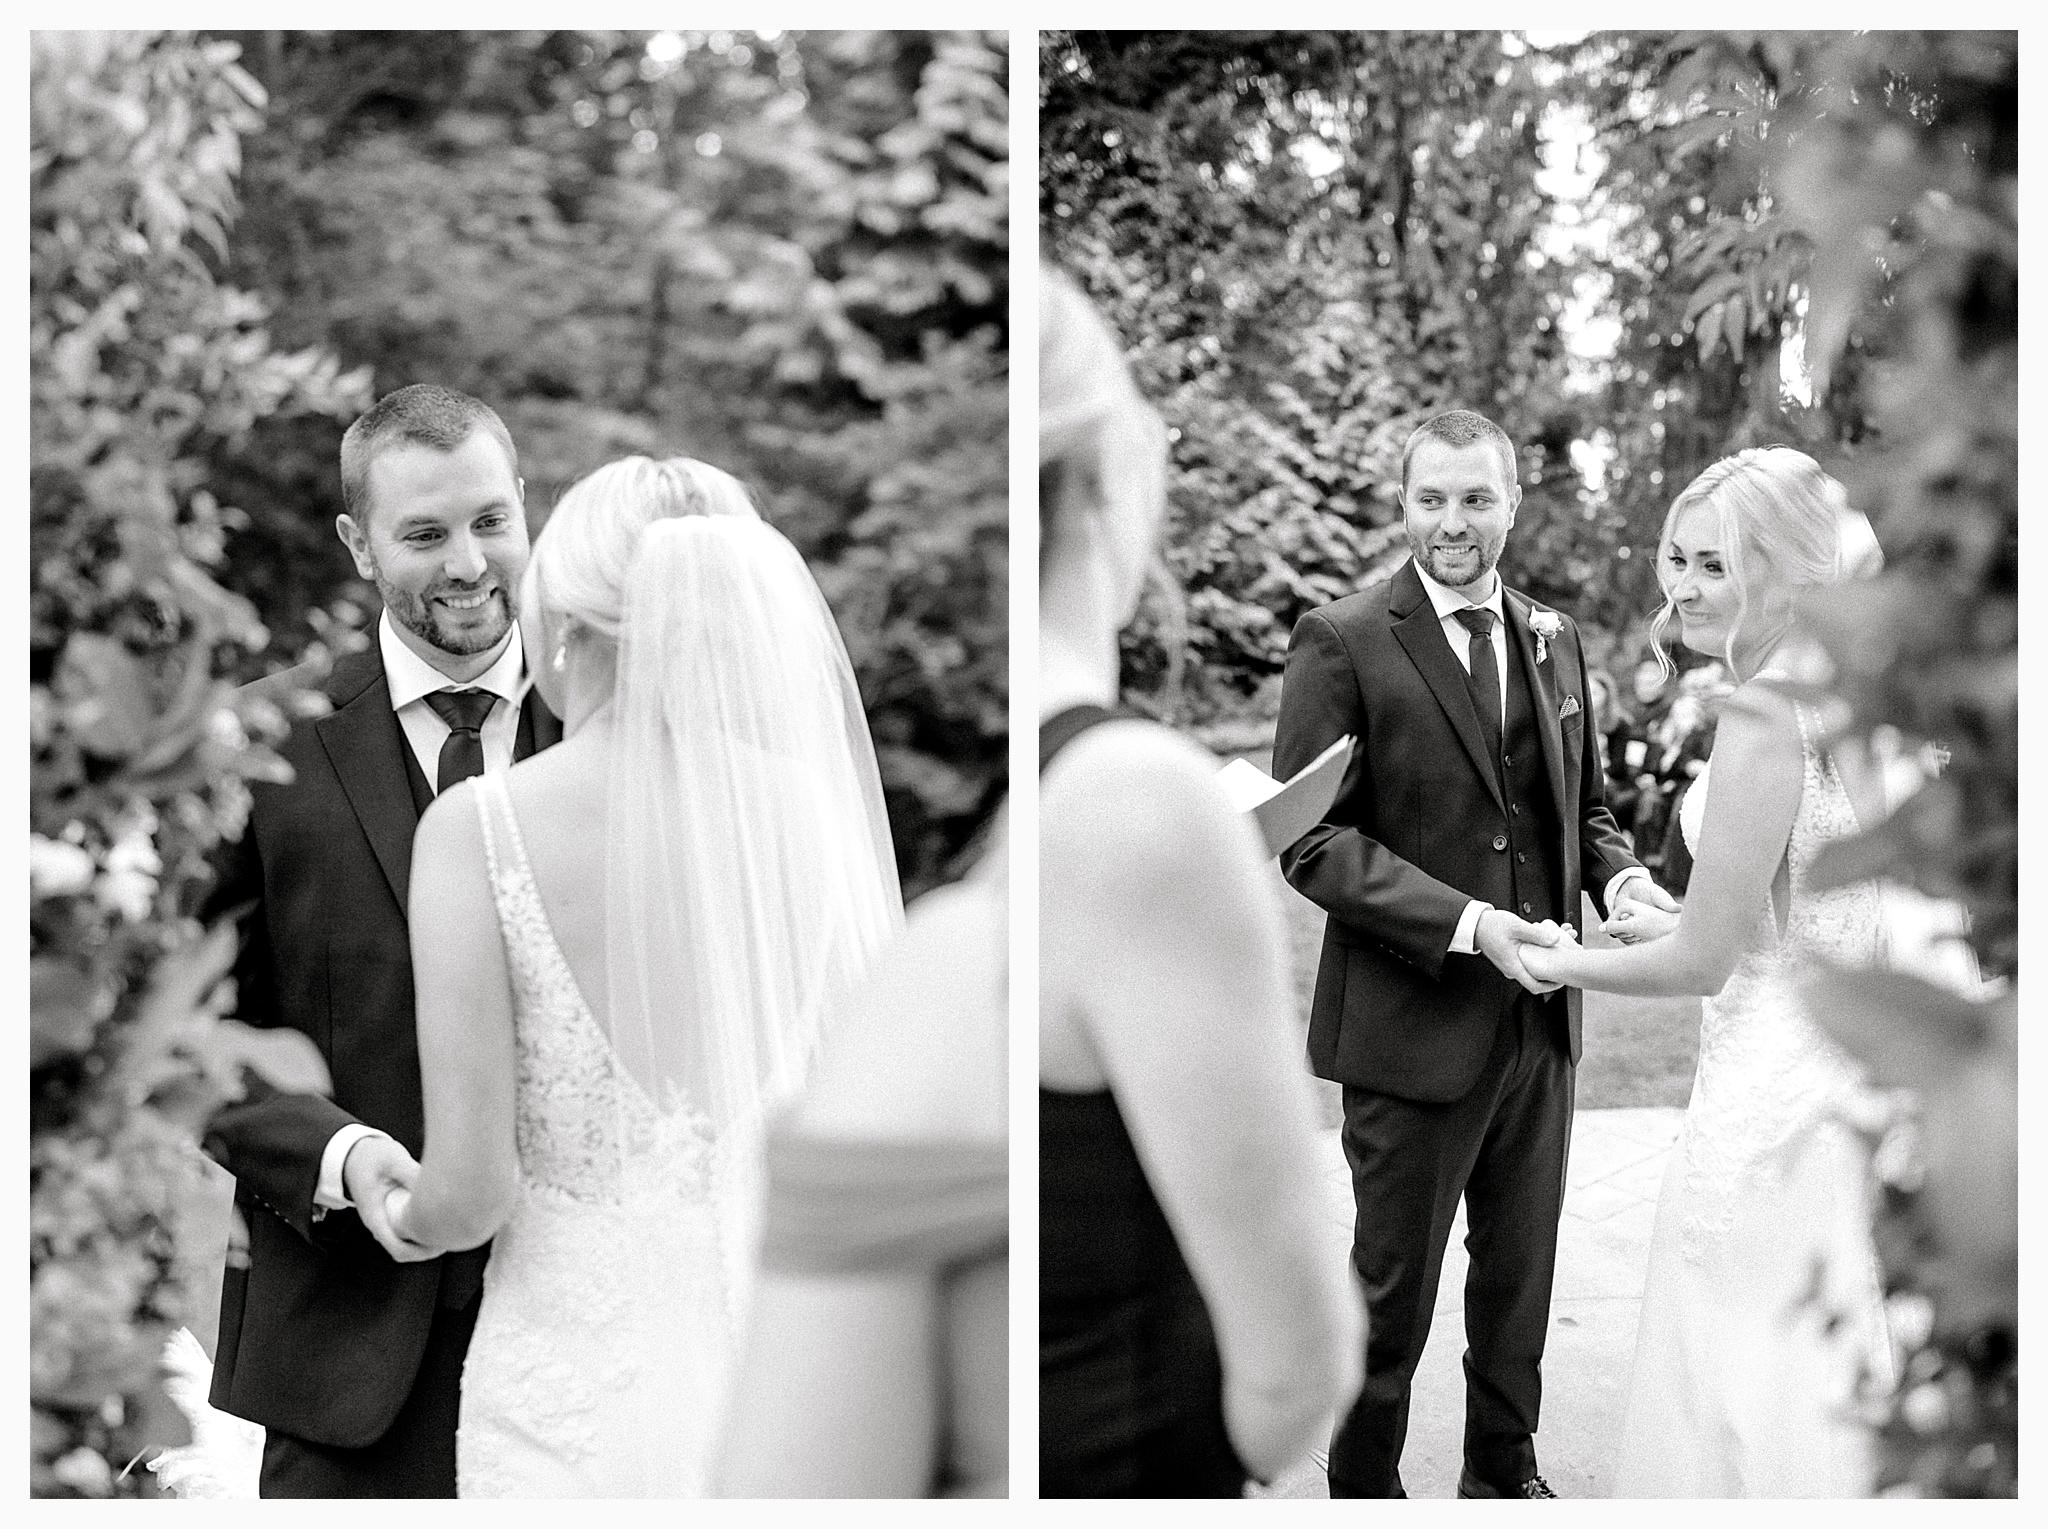 Emma Rose Company Light and Airy Wedding Photographer, Beautiful fall wedding at Rock Creek Gardens Venue in Puyallup, Washington._0076.jpg